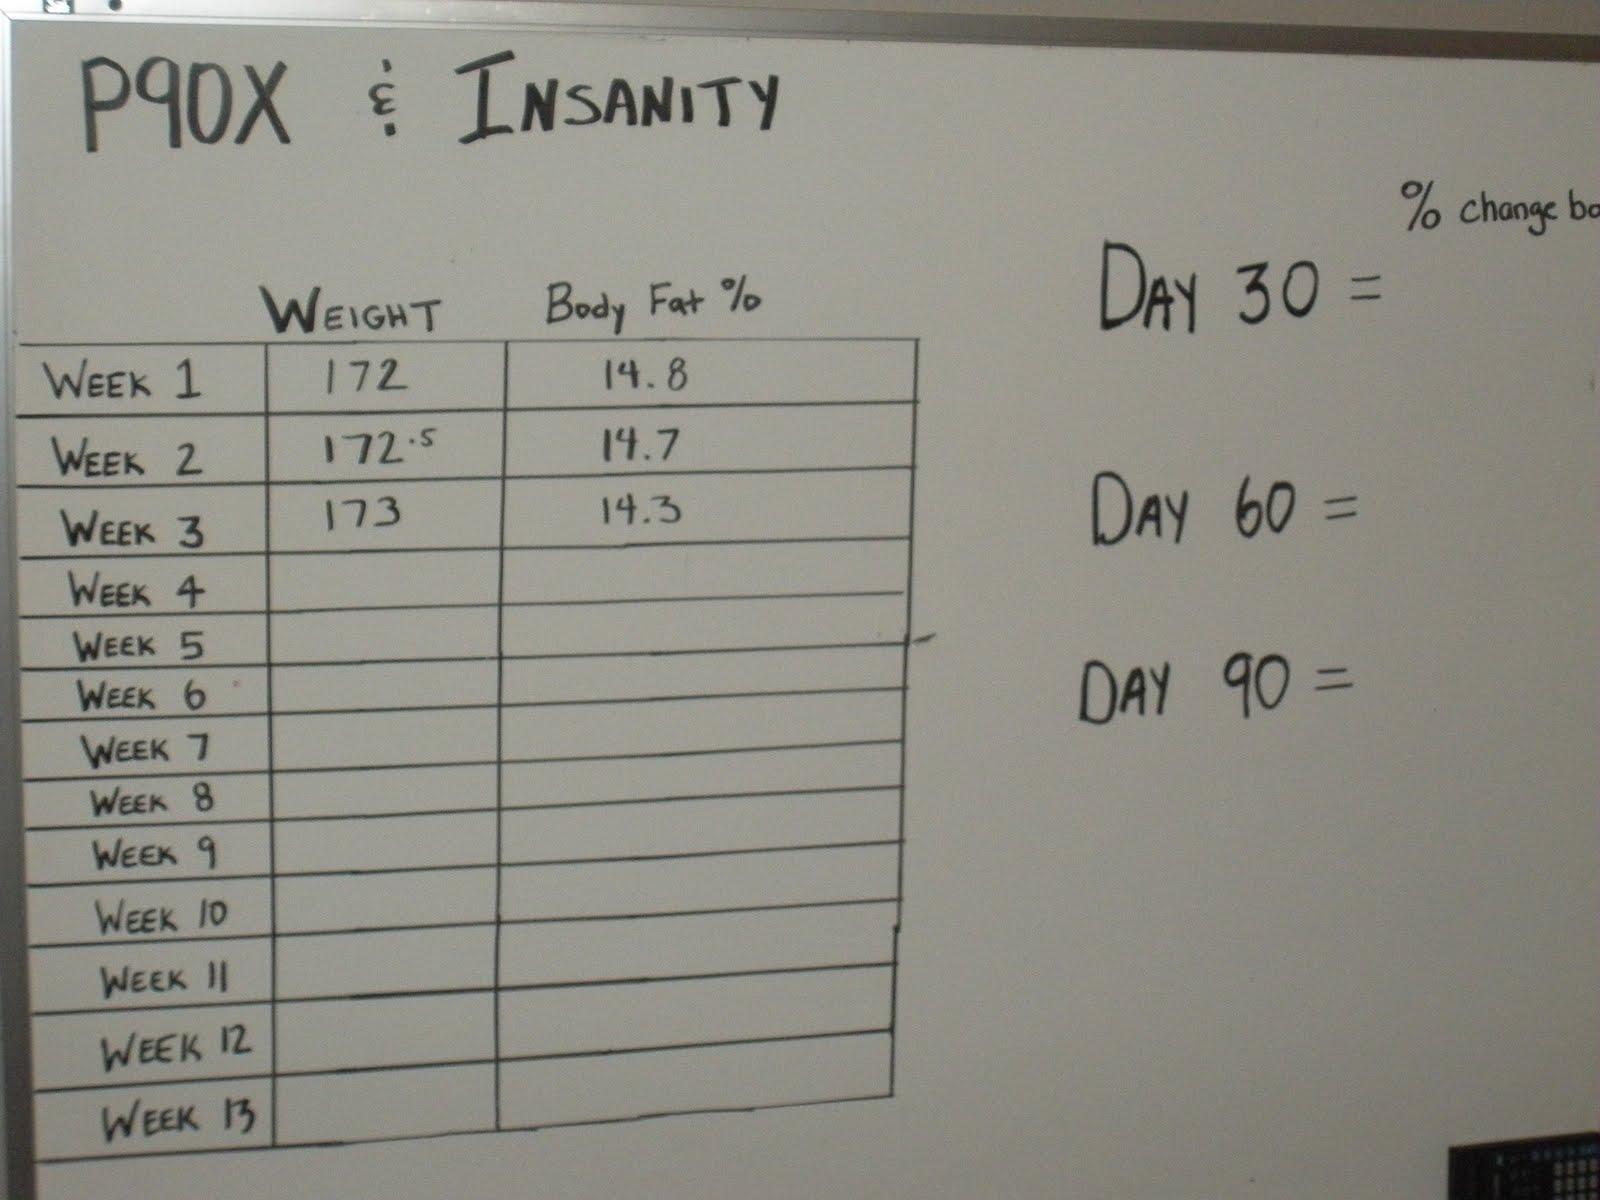 P90x Insanity Hybrid Workout